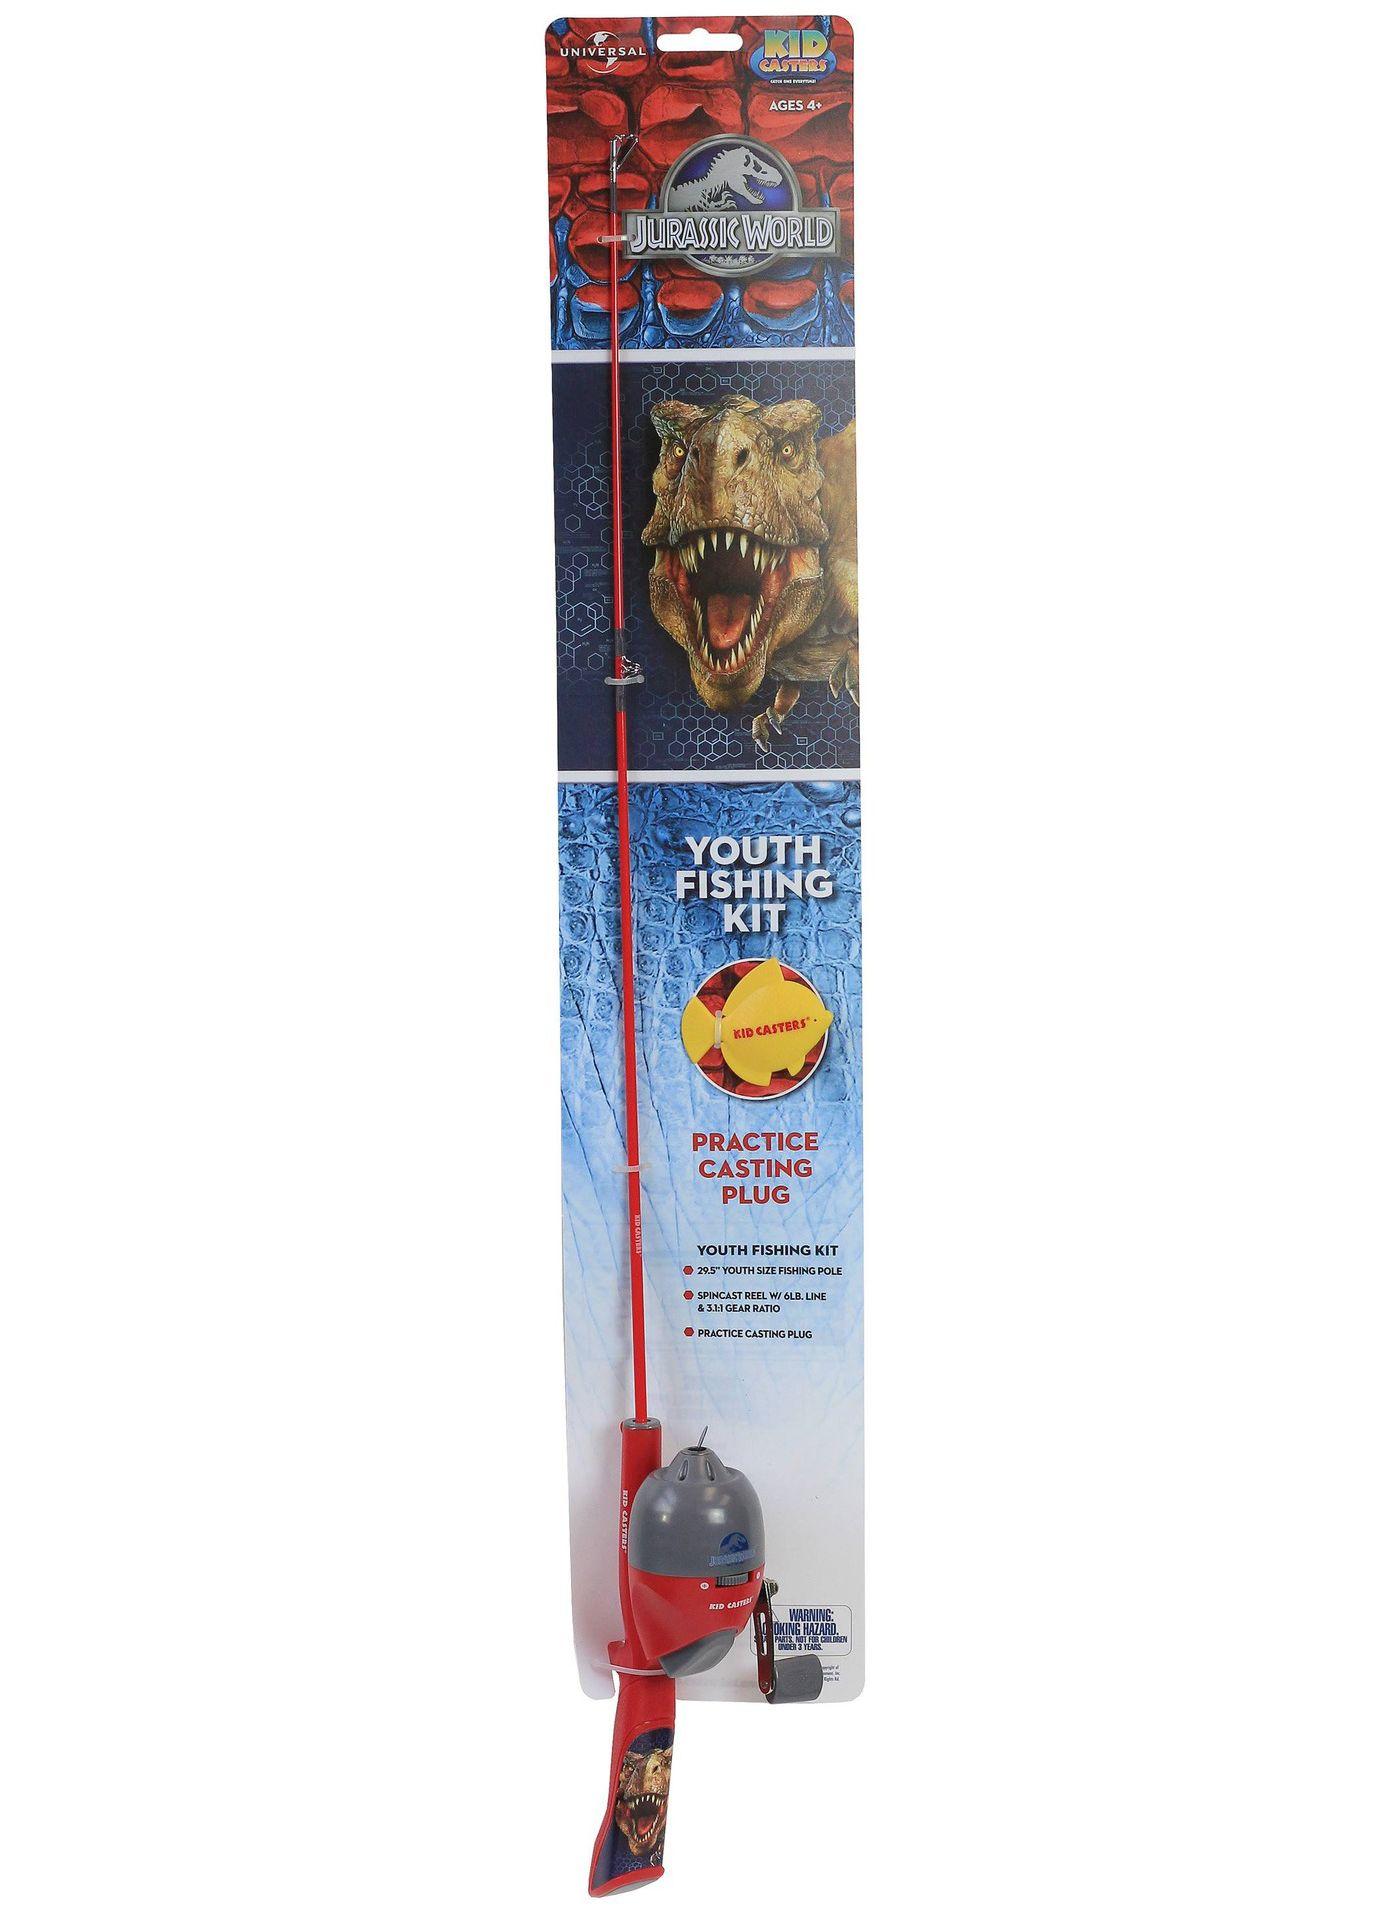 Lil' Anglers Jurassic World Youth Fishing Kit